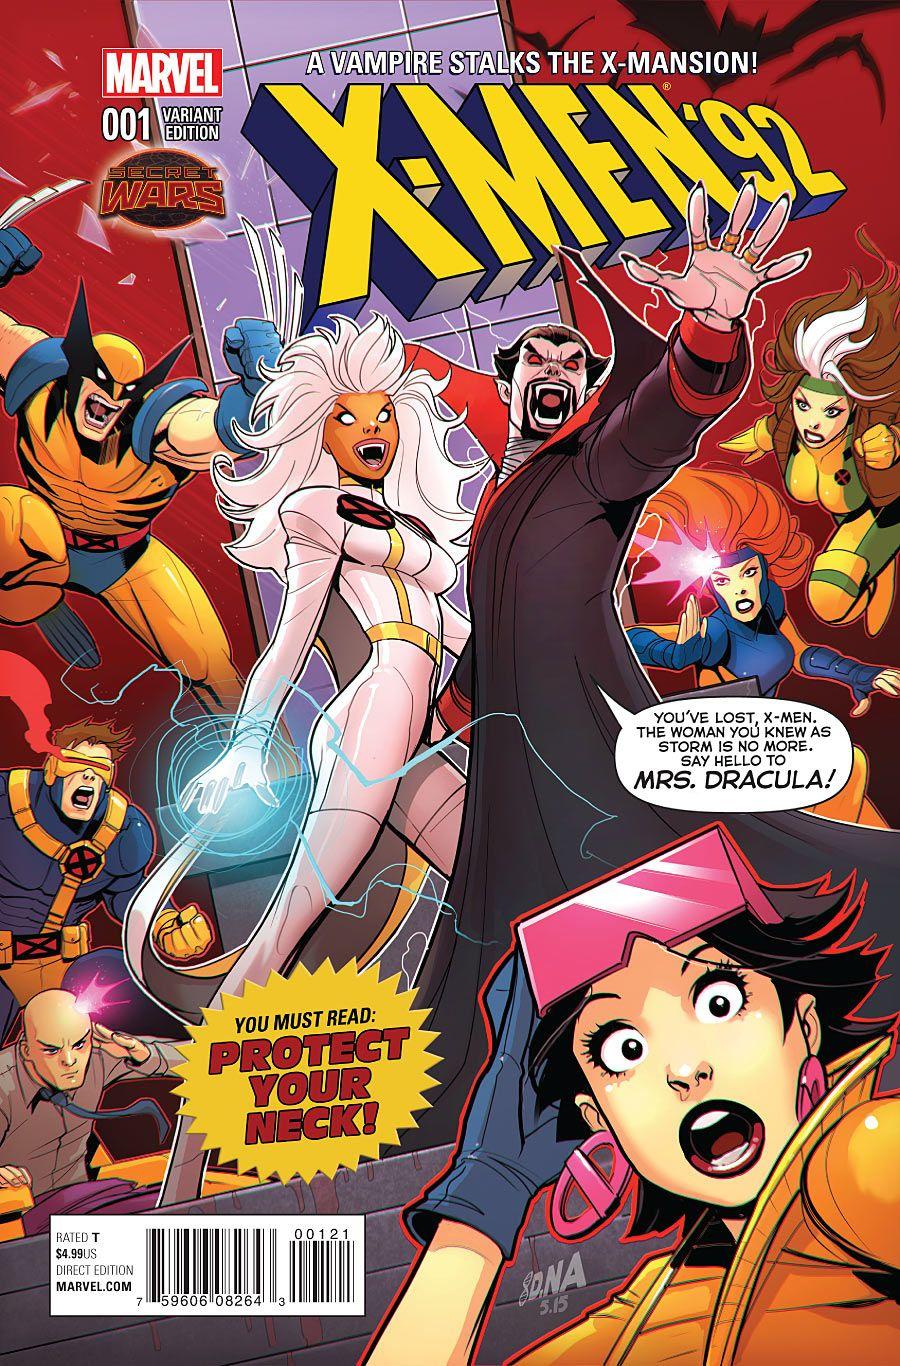 Preview X Men 92 1 Page 5 Of 9 X Men Marvel Comic Character Comics